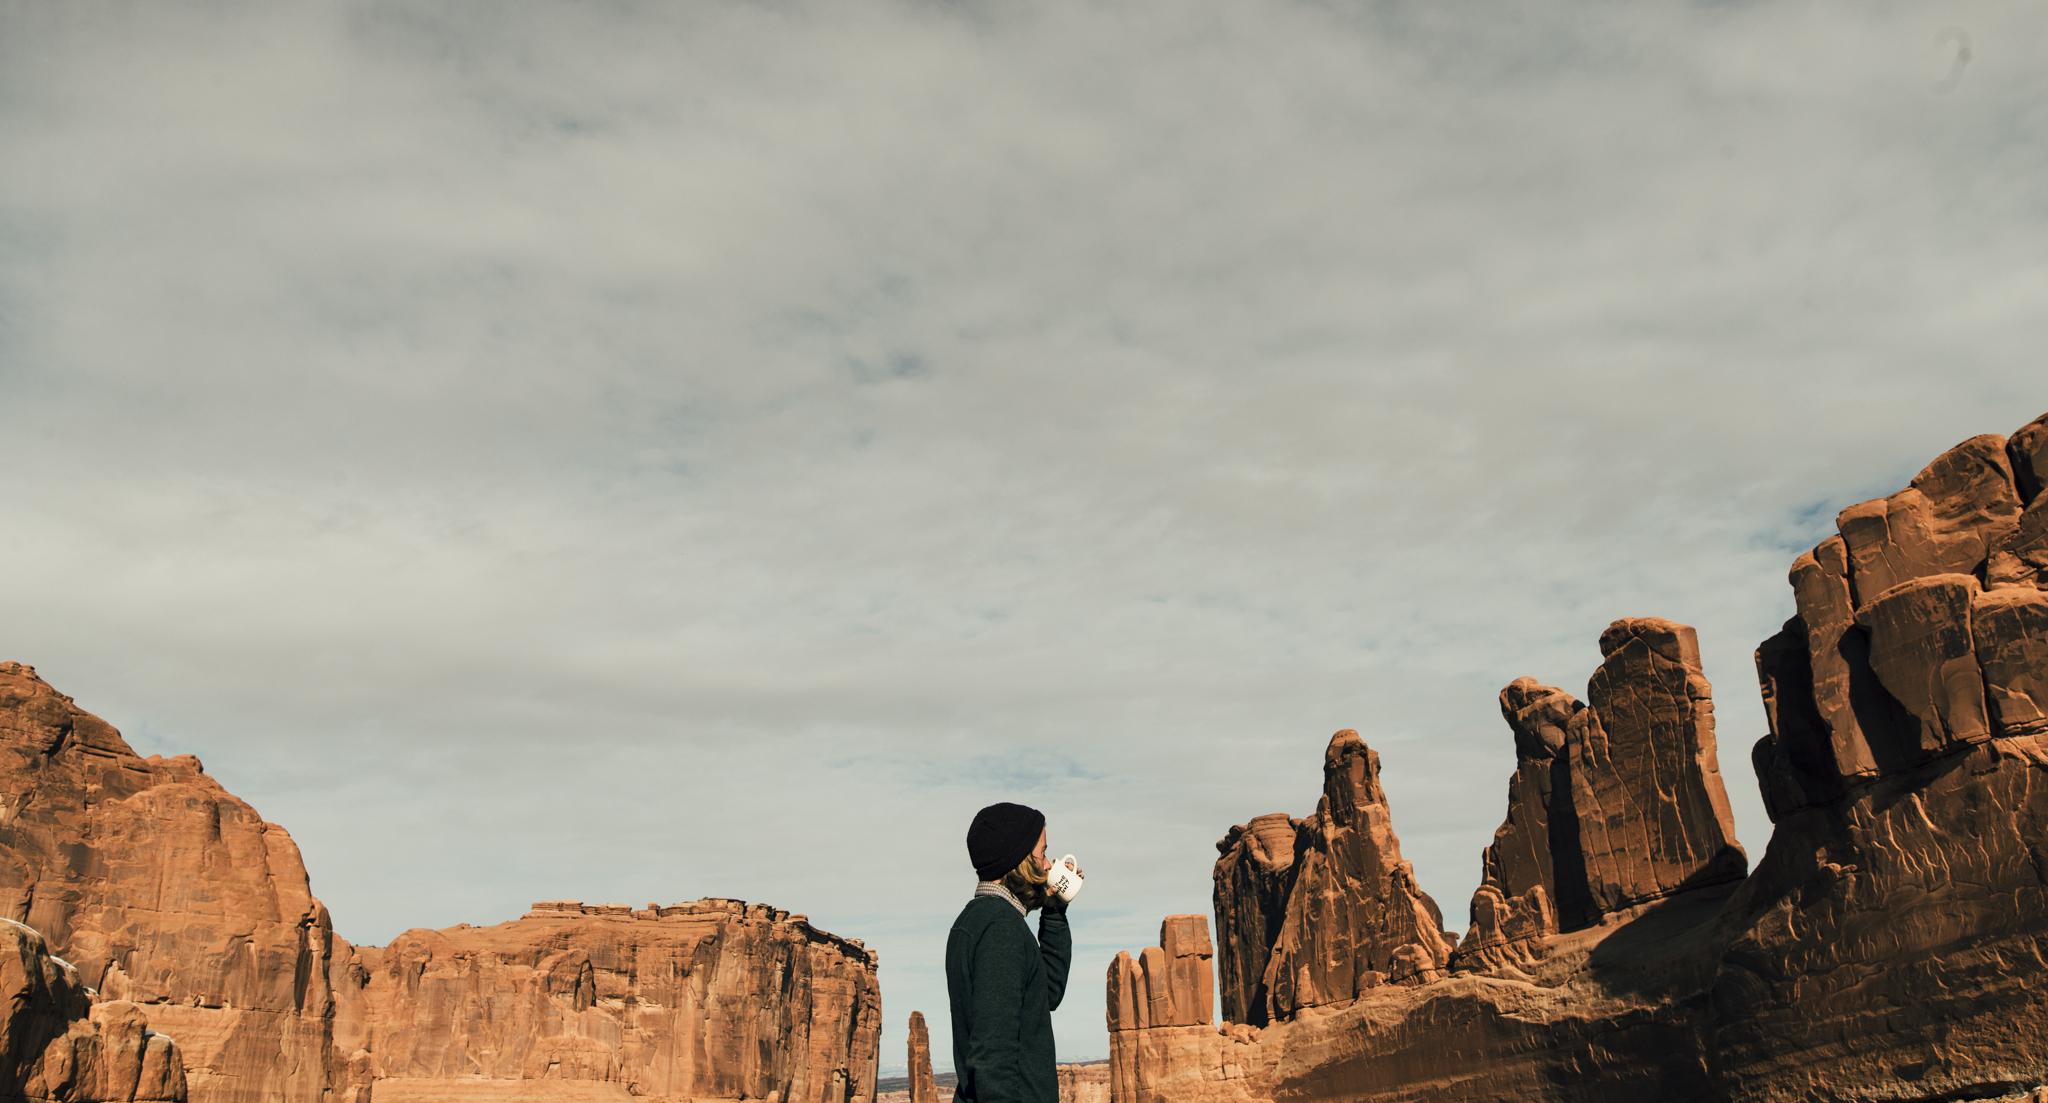 Isaiah-&-Taylor-Photography---White-Sand-Dunes-5.jpg